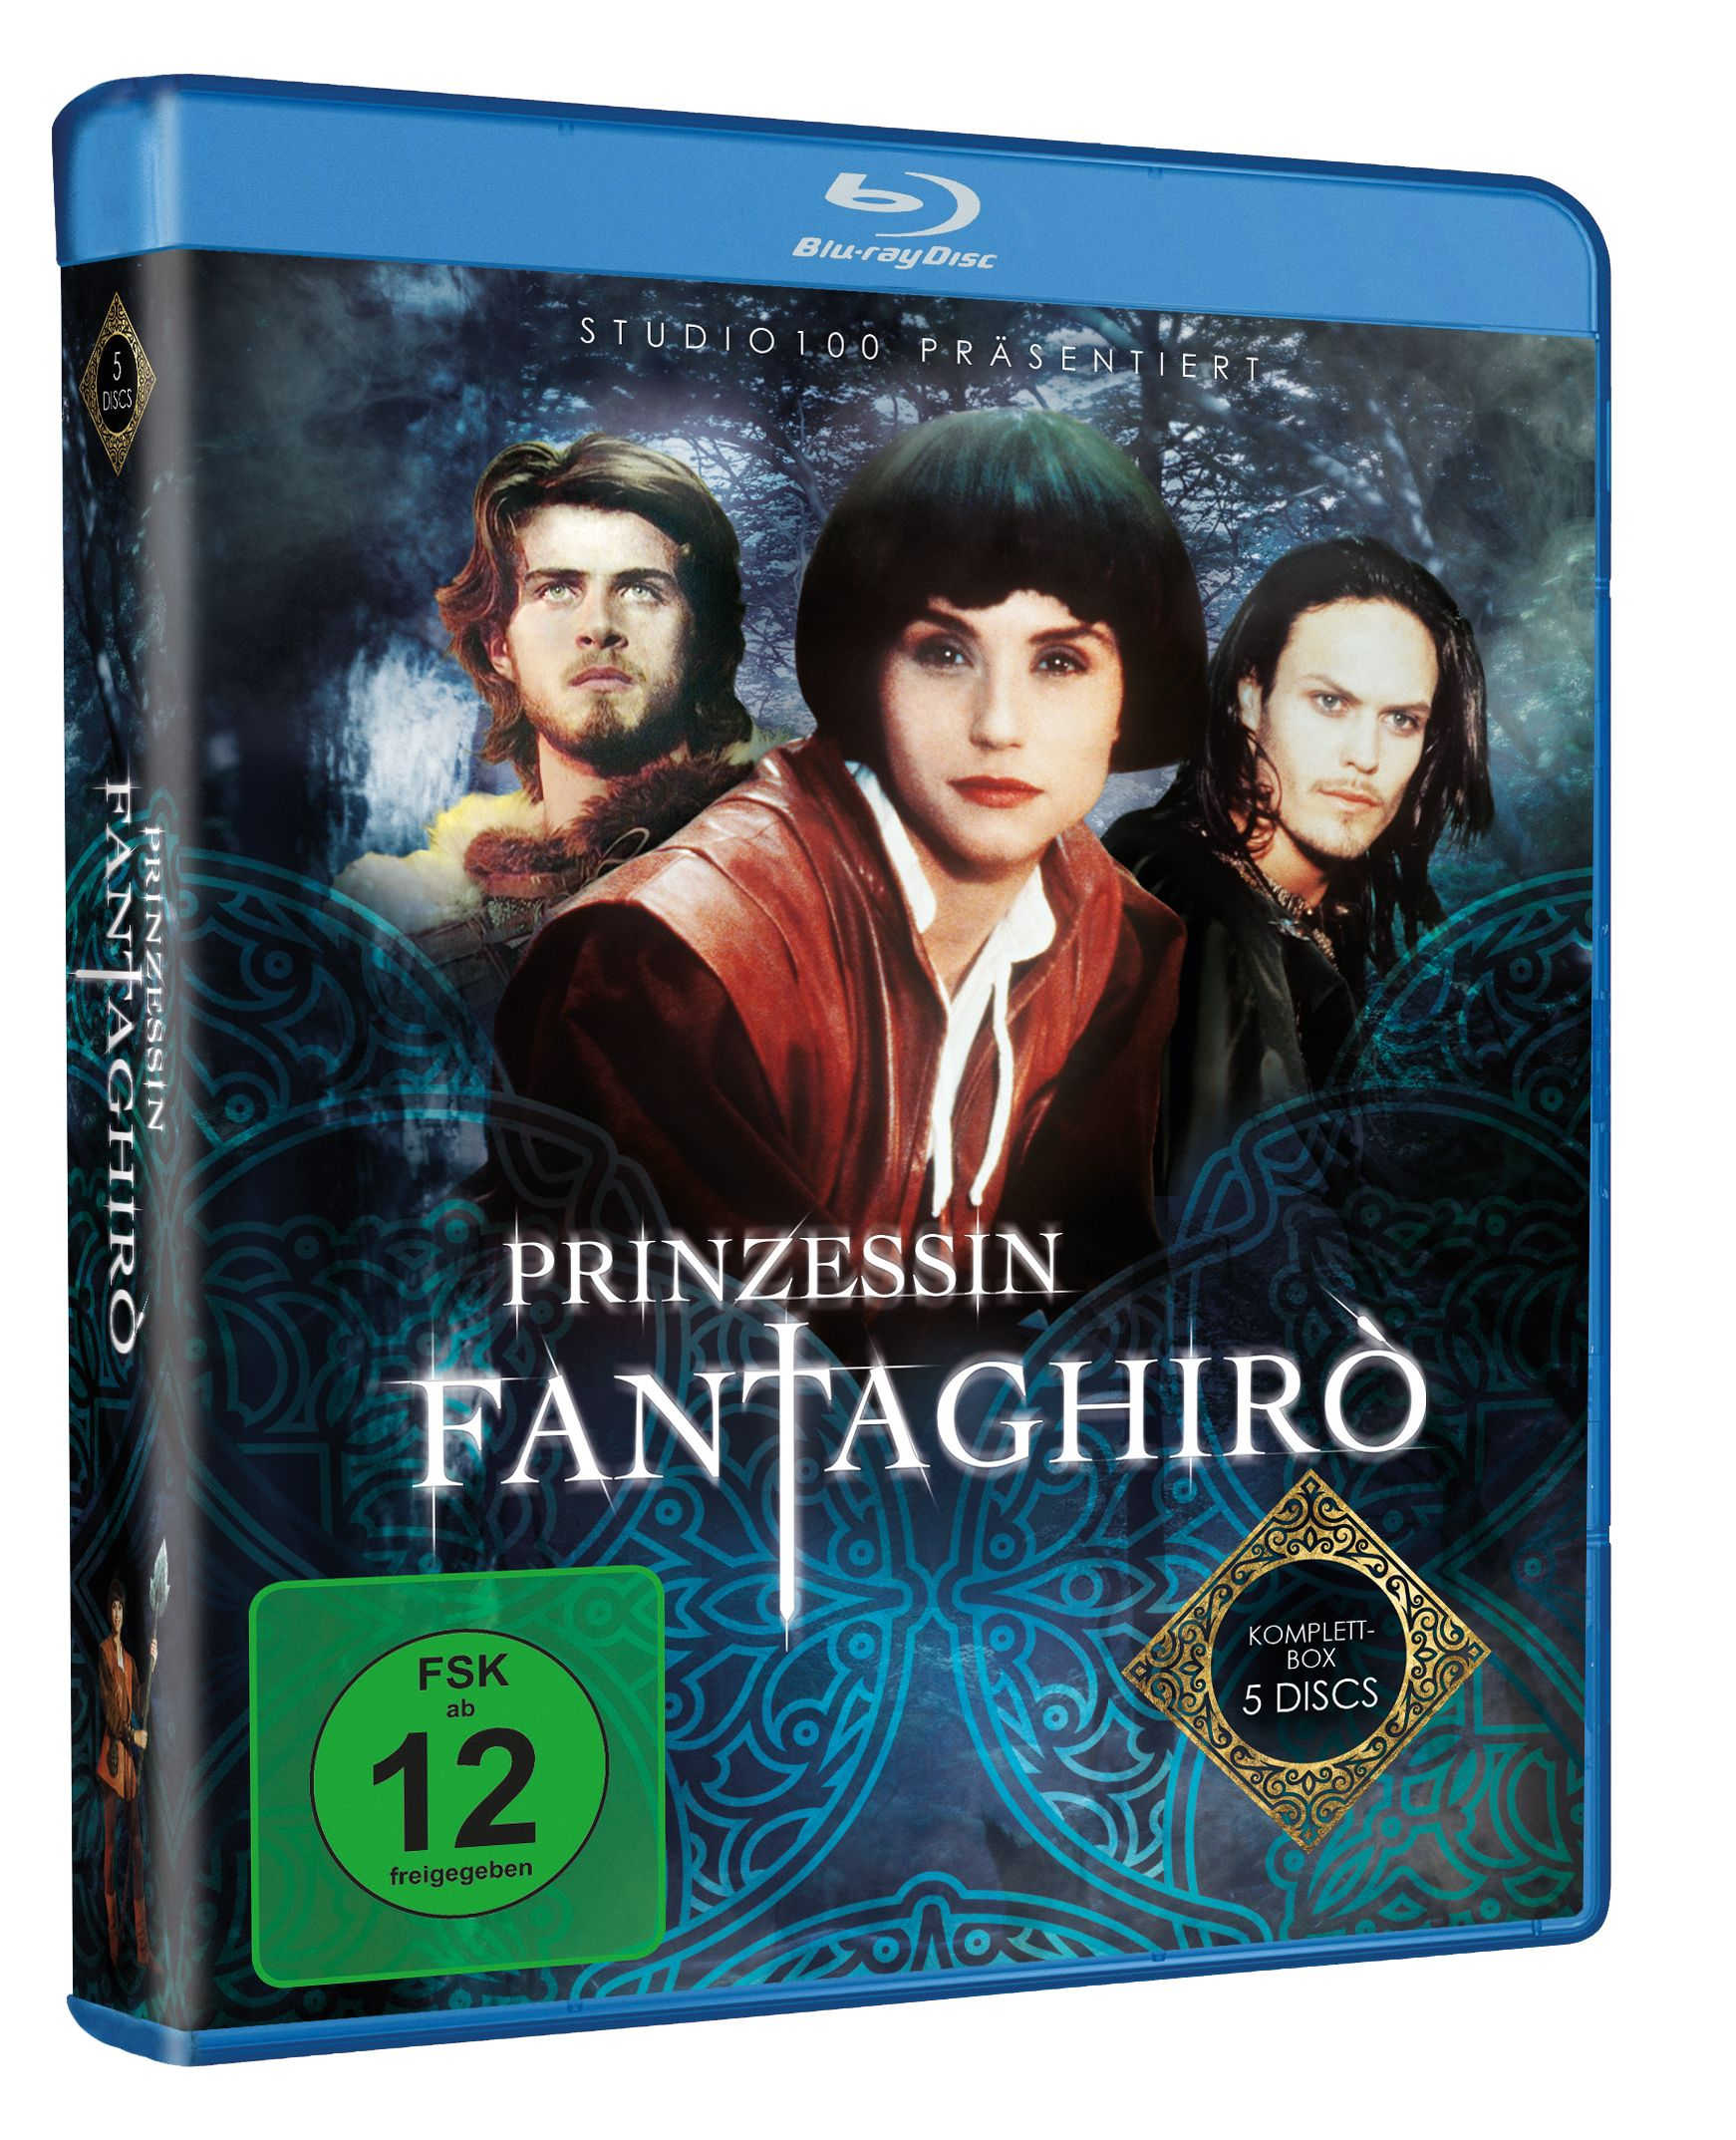 Fantaghiro